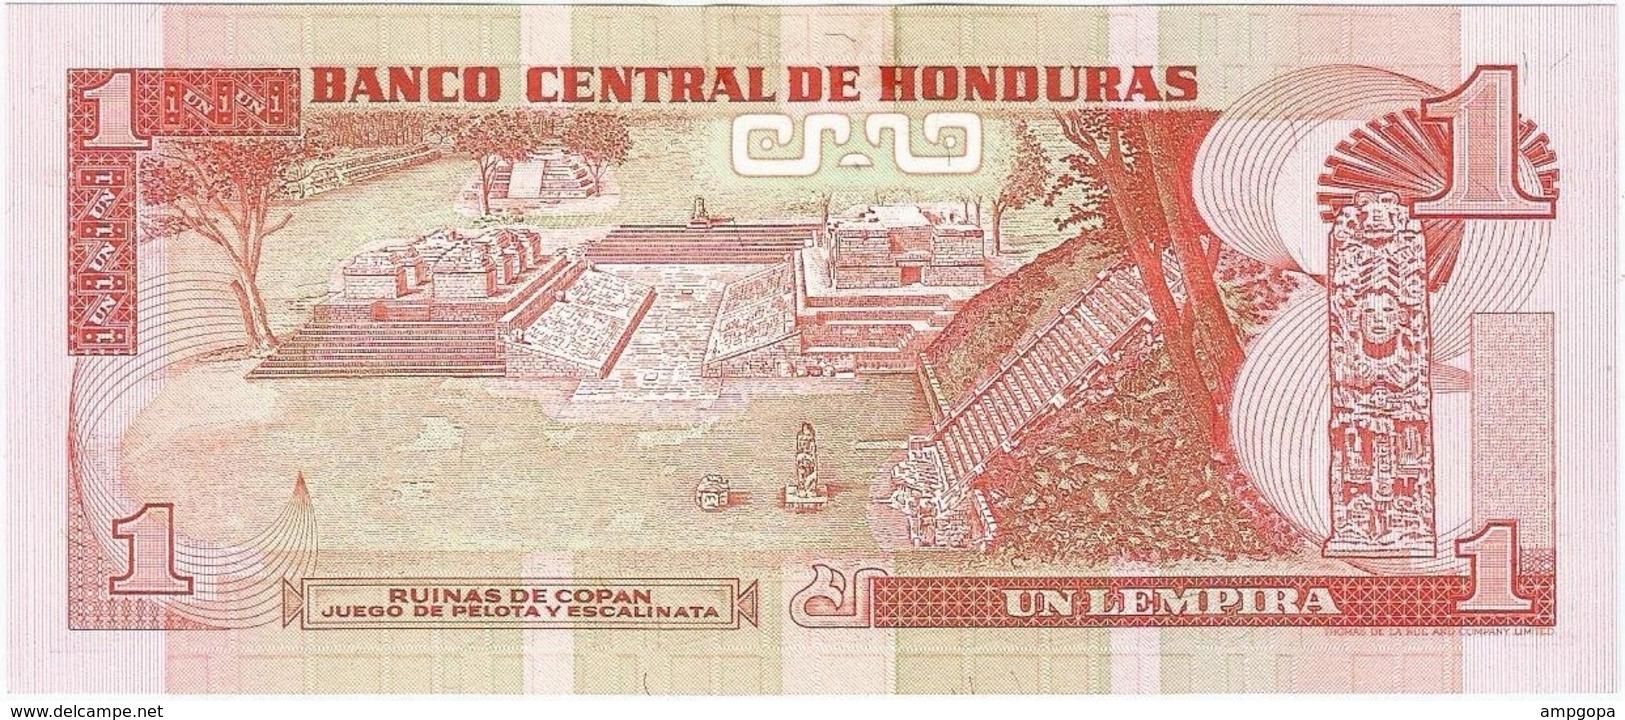 Honduras 1 Lempira 12-5-1994 Pk 76 A UNC - Honduras